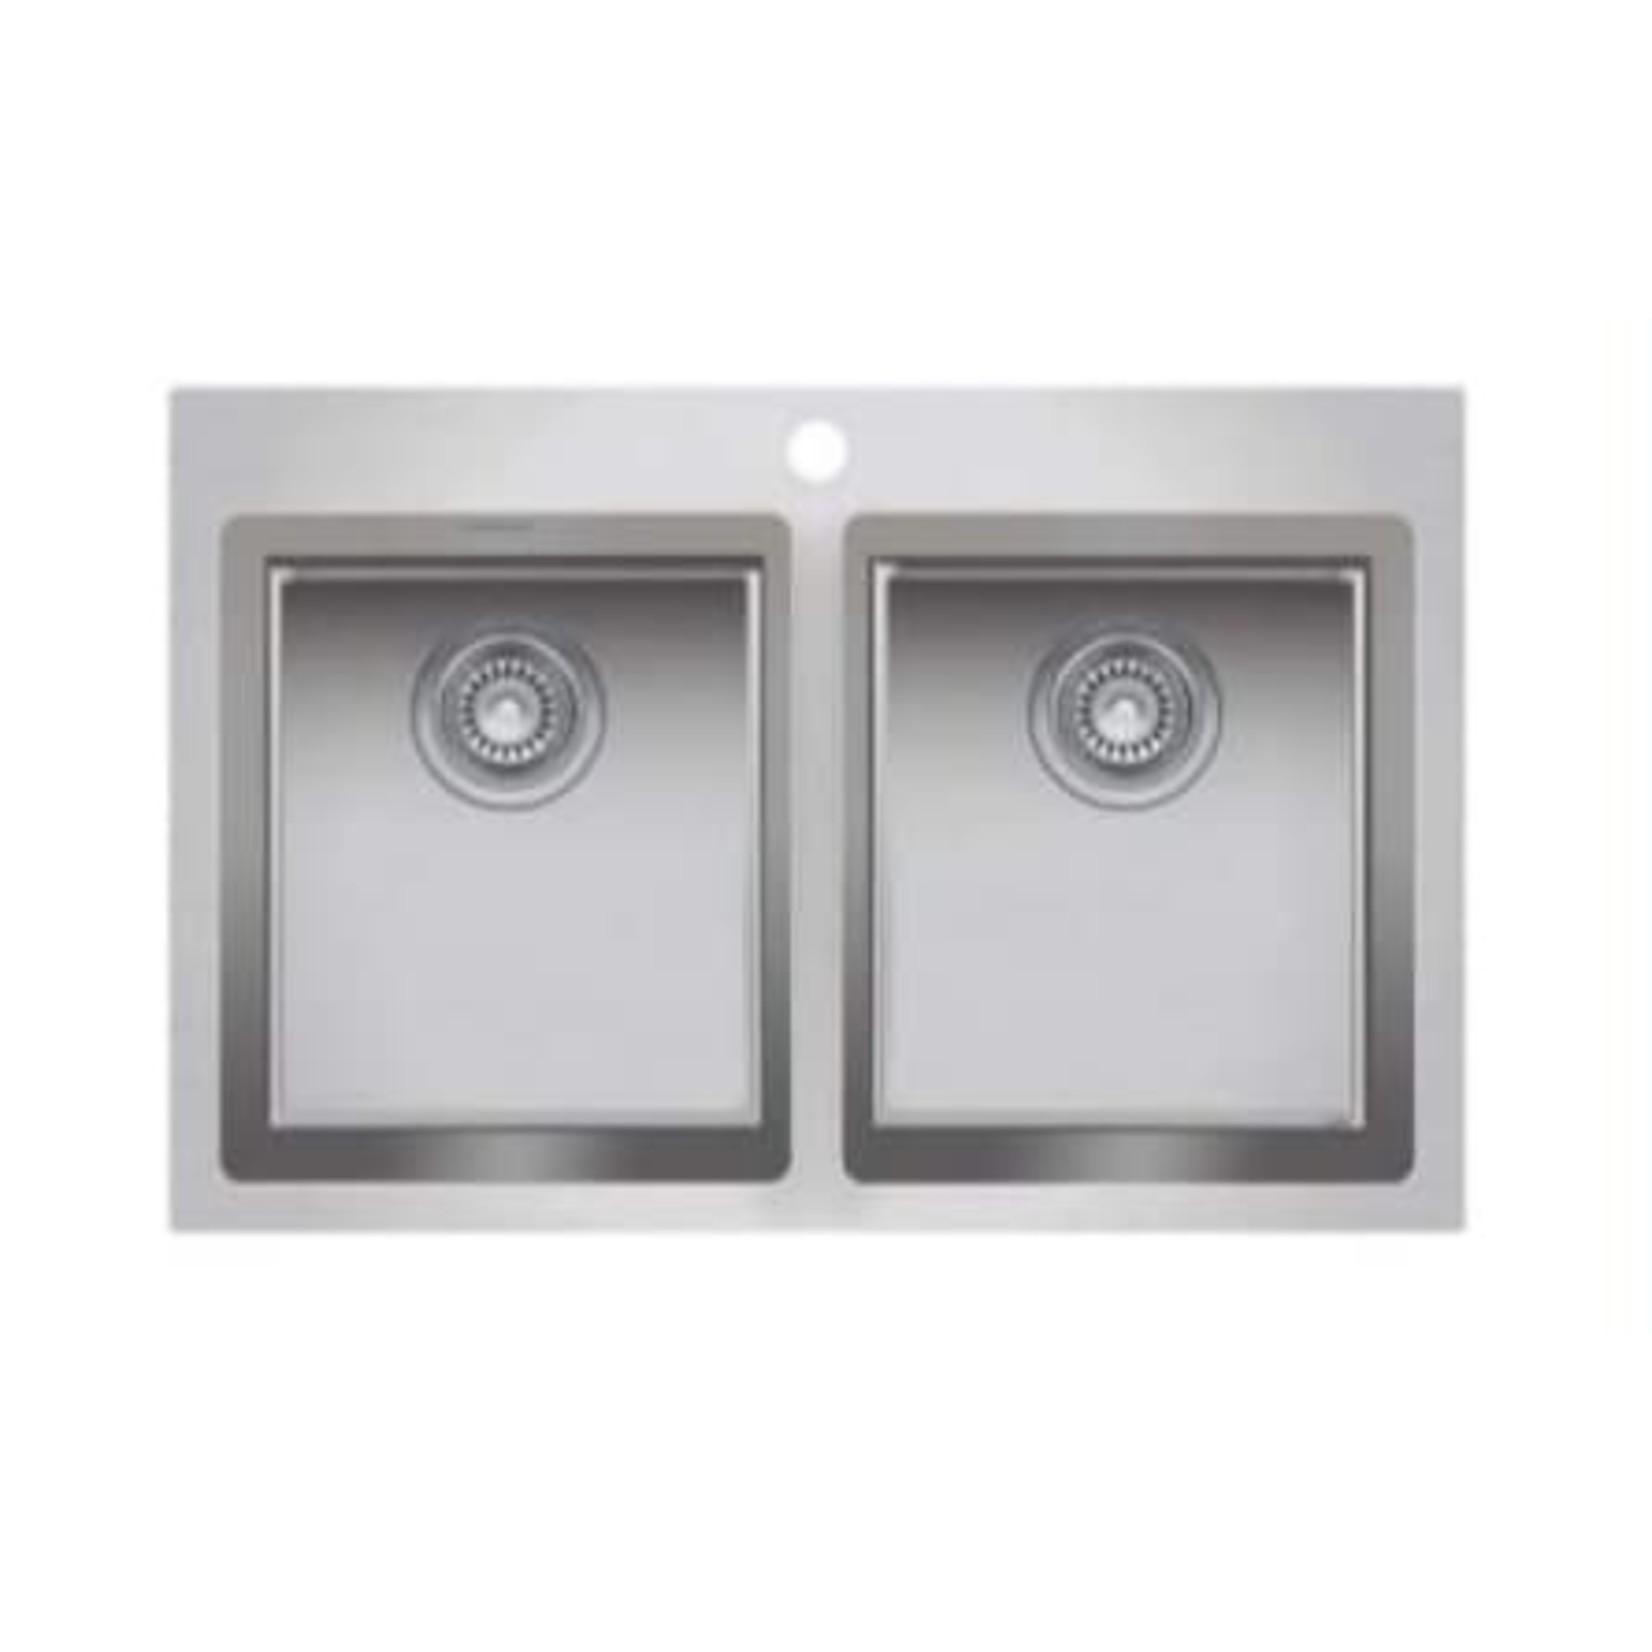 "Double bowl countertop kitchen sink 313/8 ""x 205/8"" x 9/9 ""ZR200"